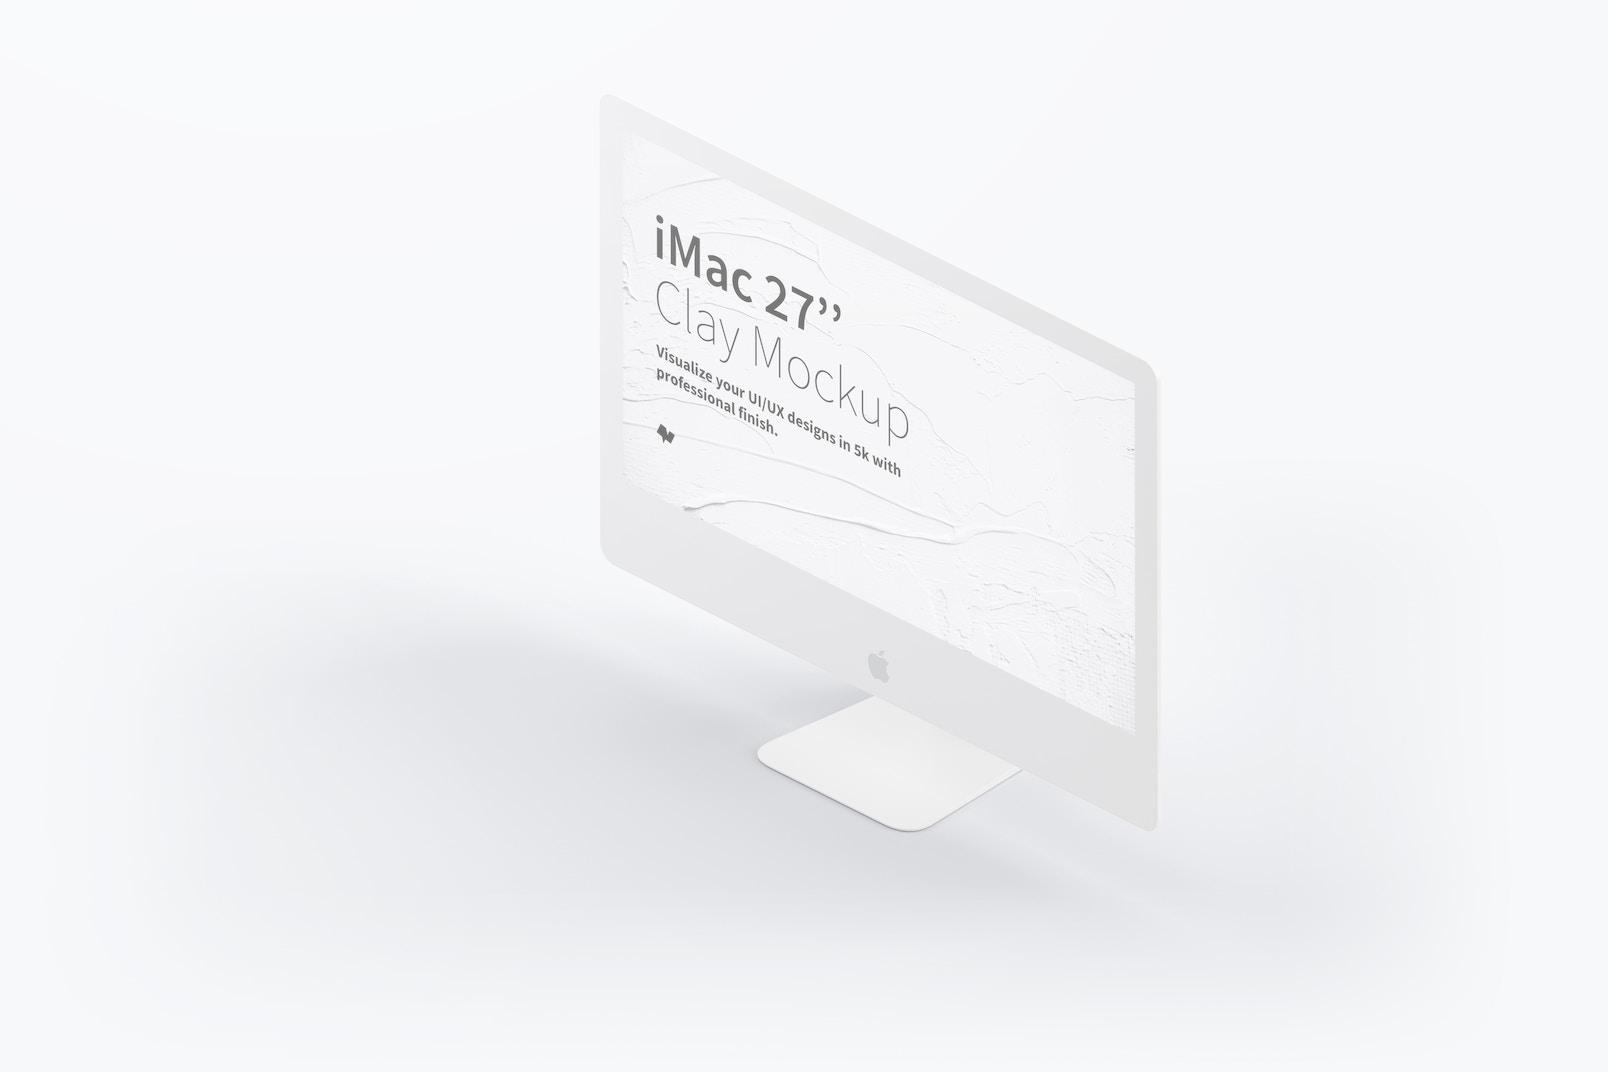 "Clay iMac 27"" Mockup, Isometric Right View"